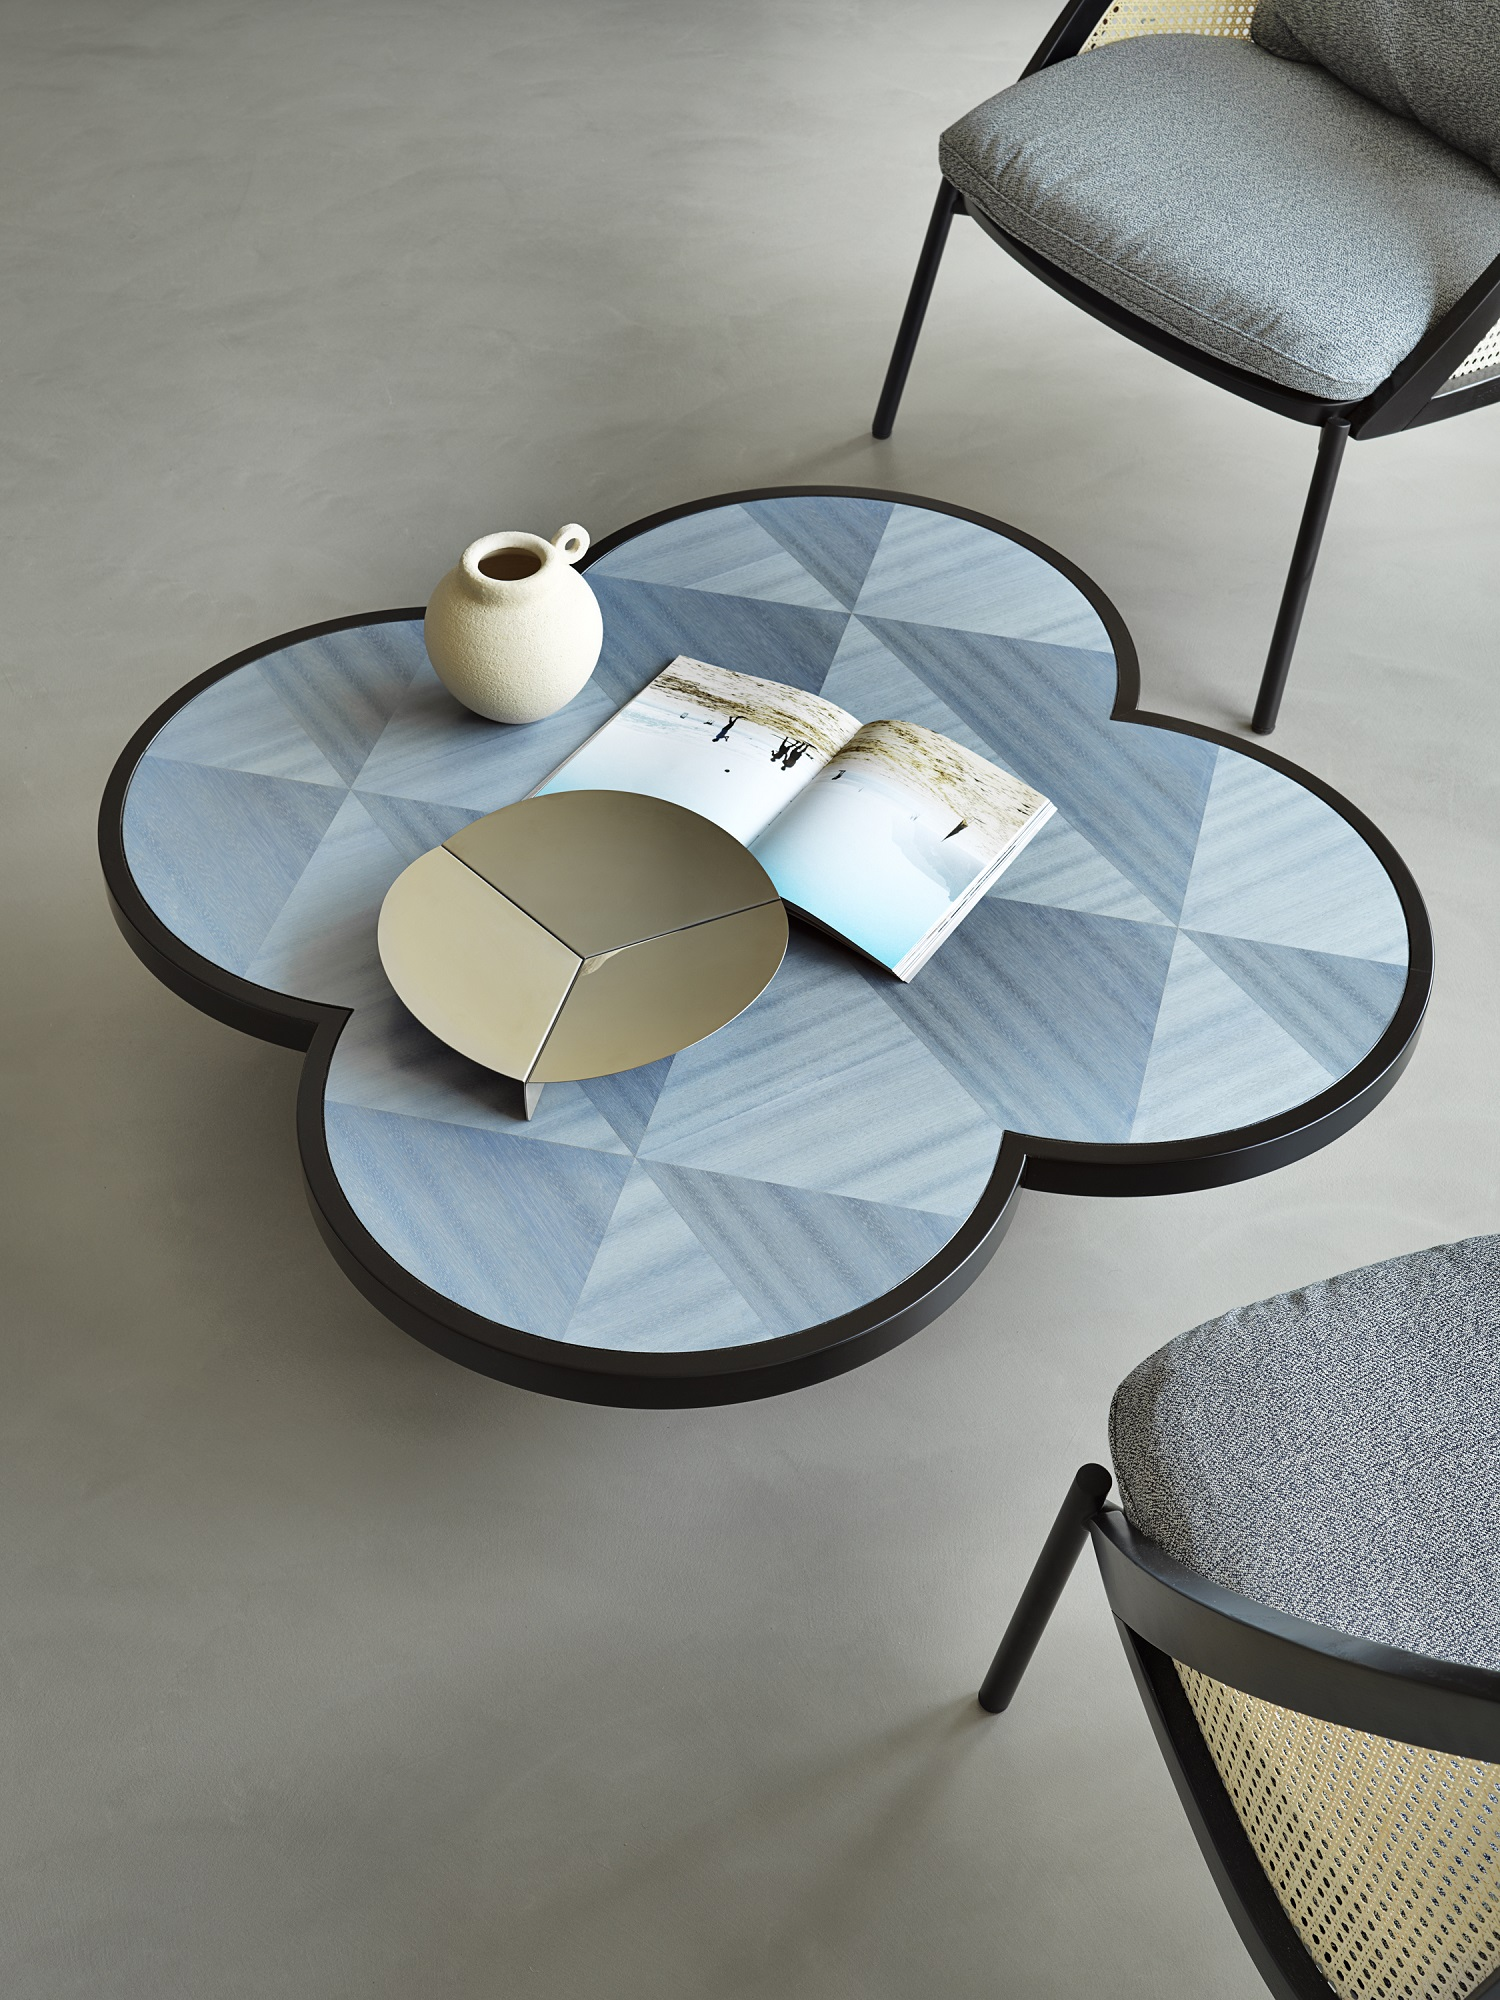 tavolino CARYLLON, design Cristina Celestino per Gebrueder Thonet Vienna